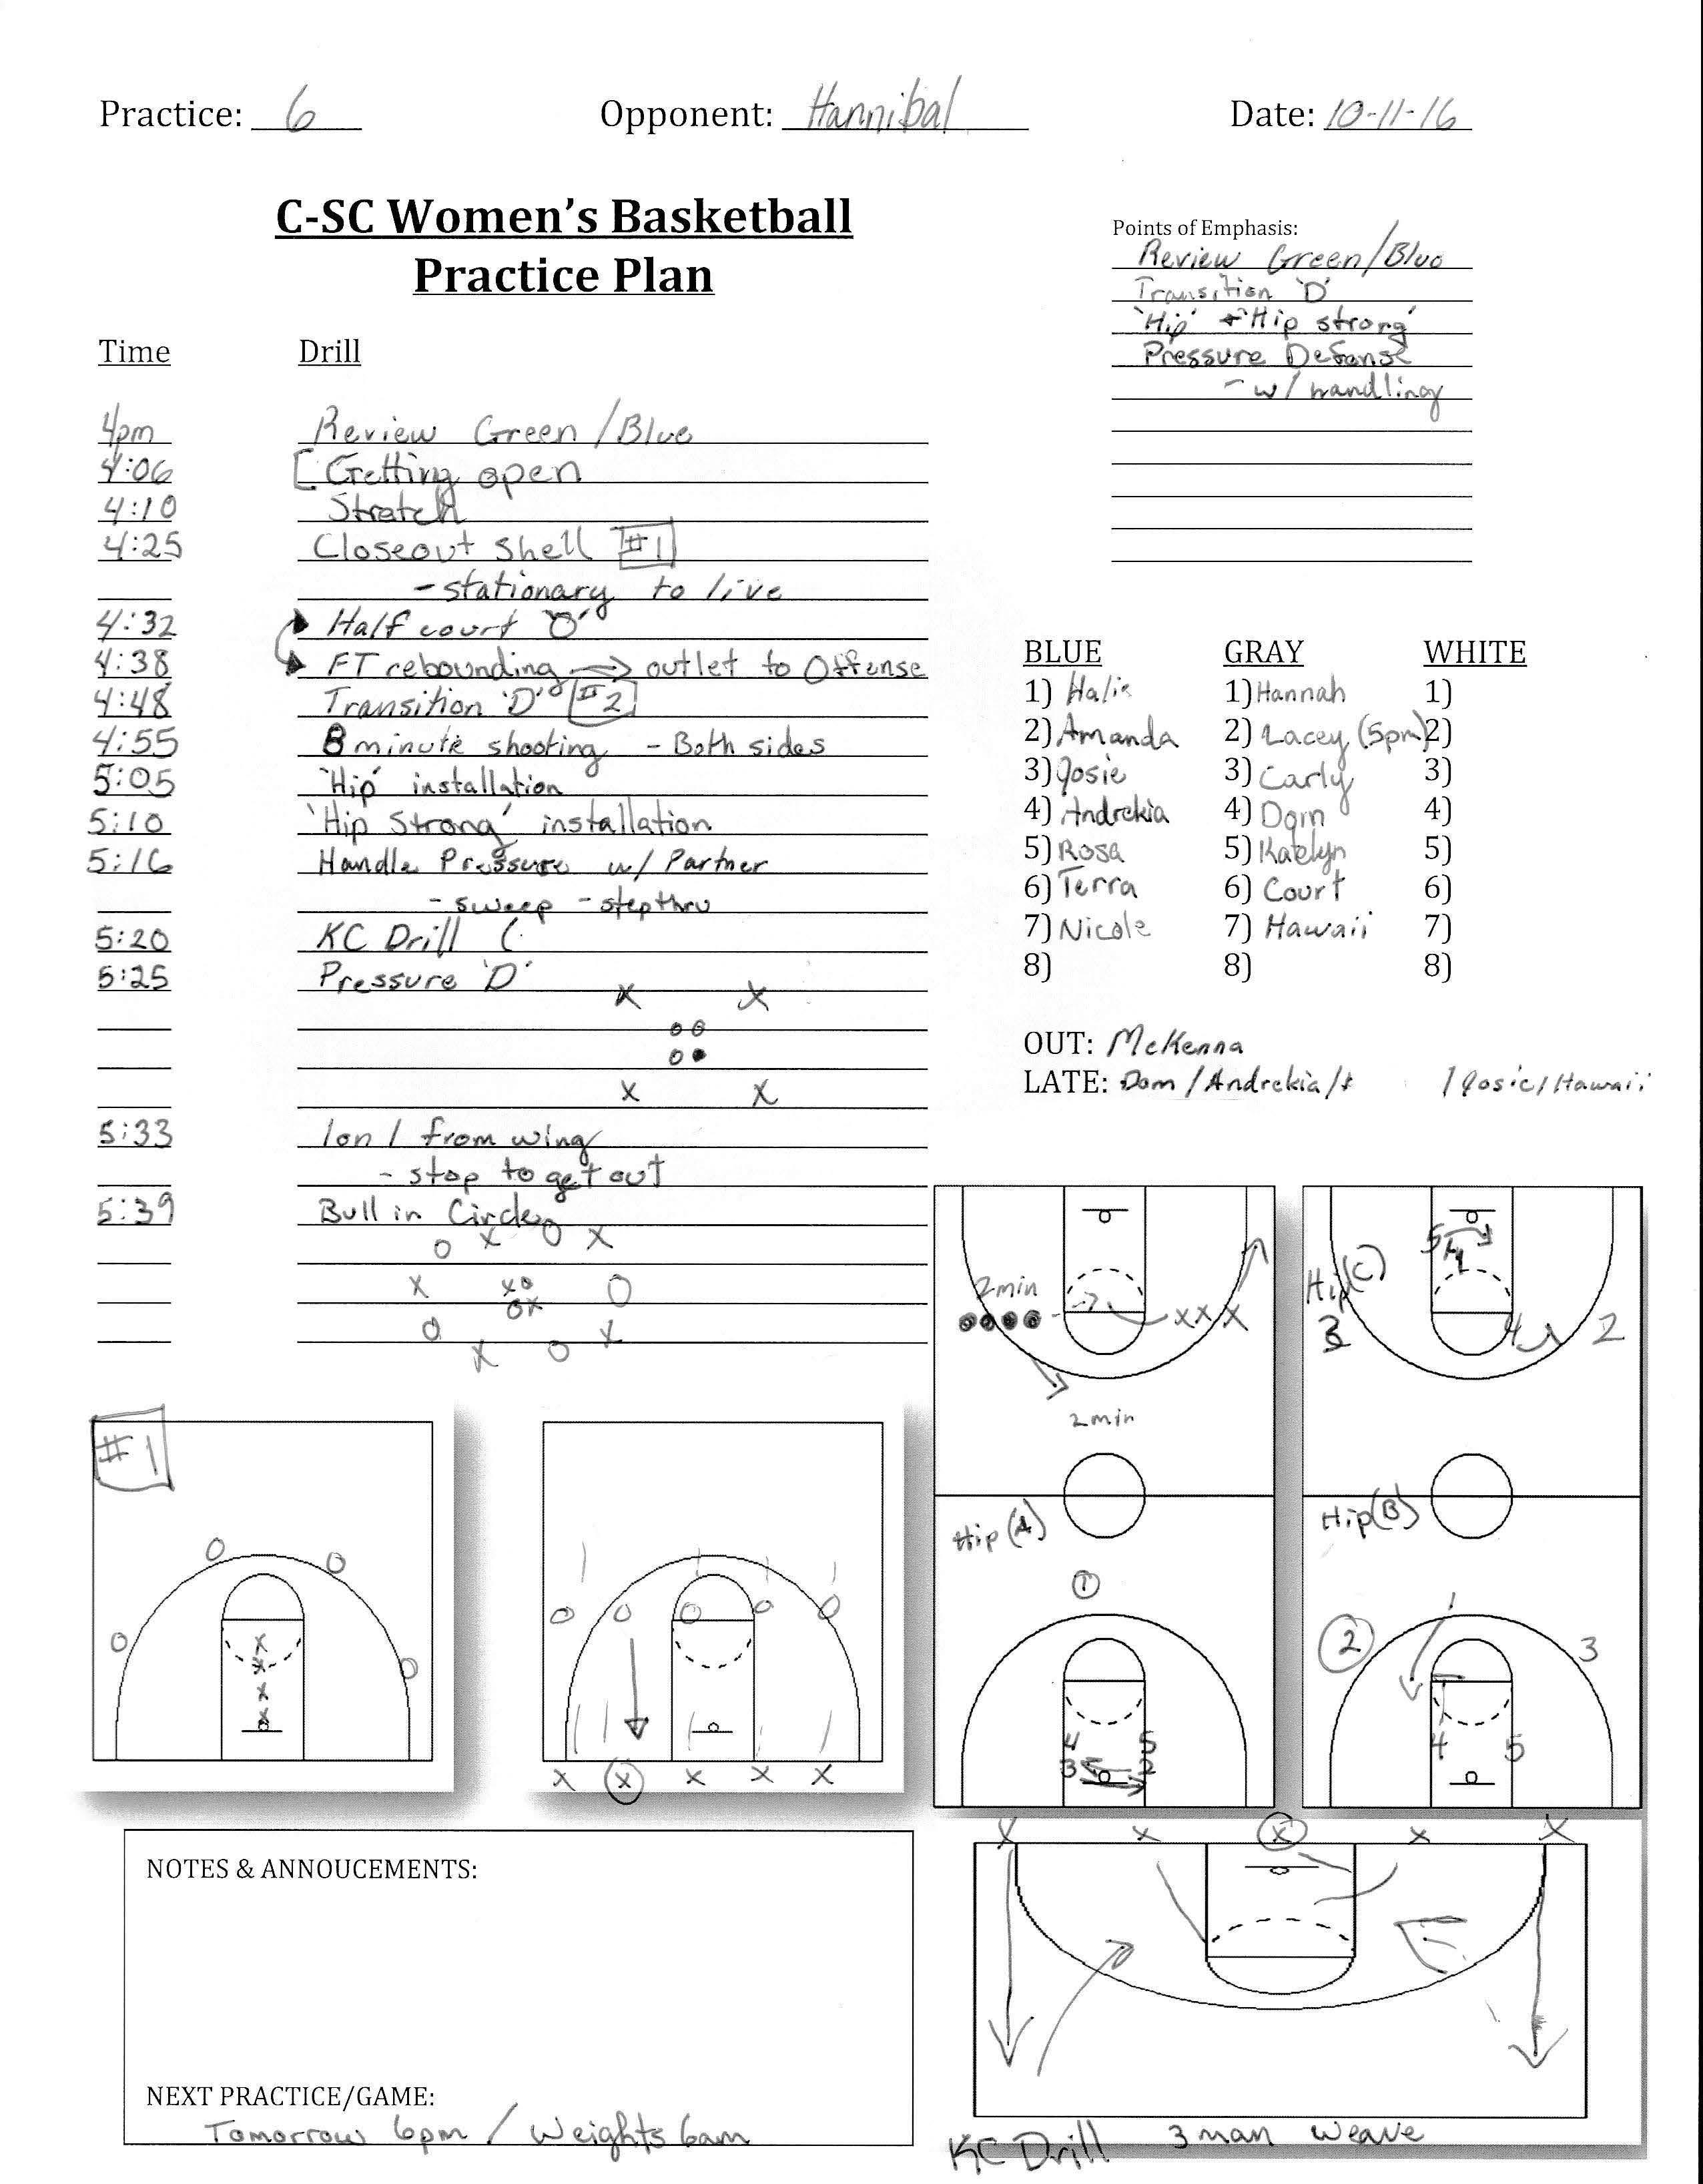 Culver Stockton WBB Practice Plan